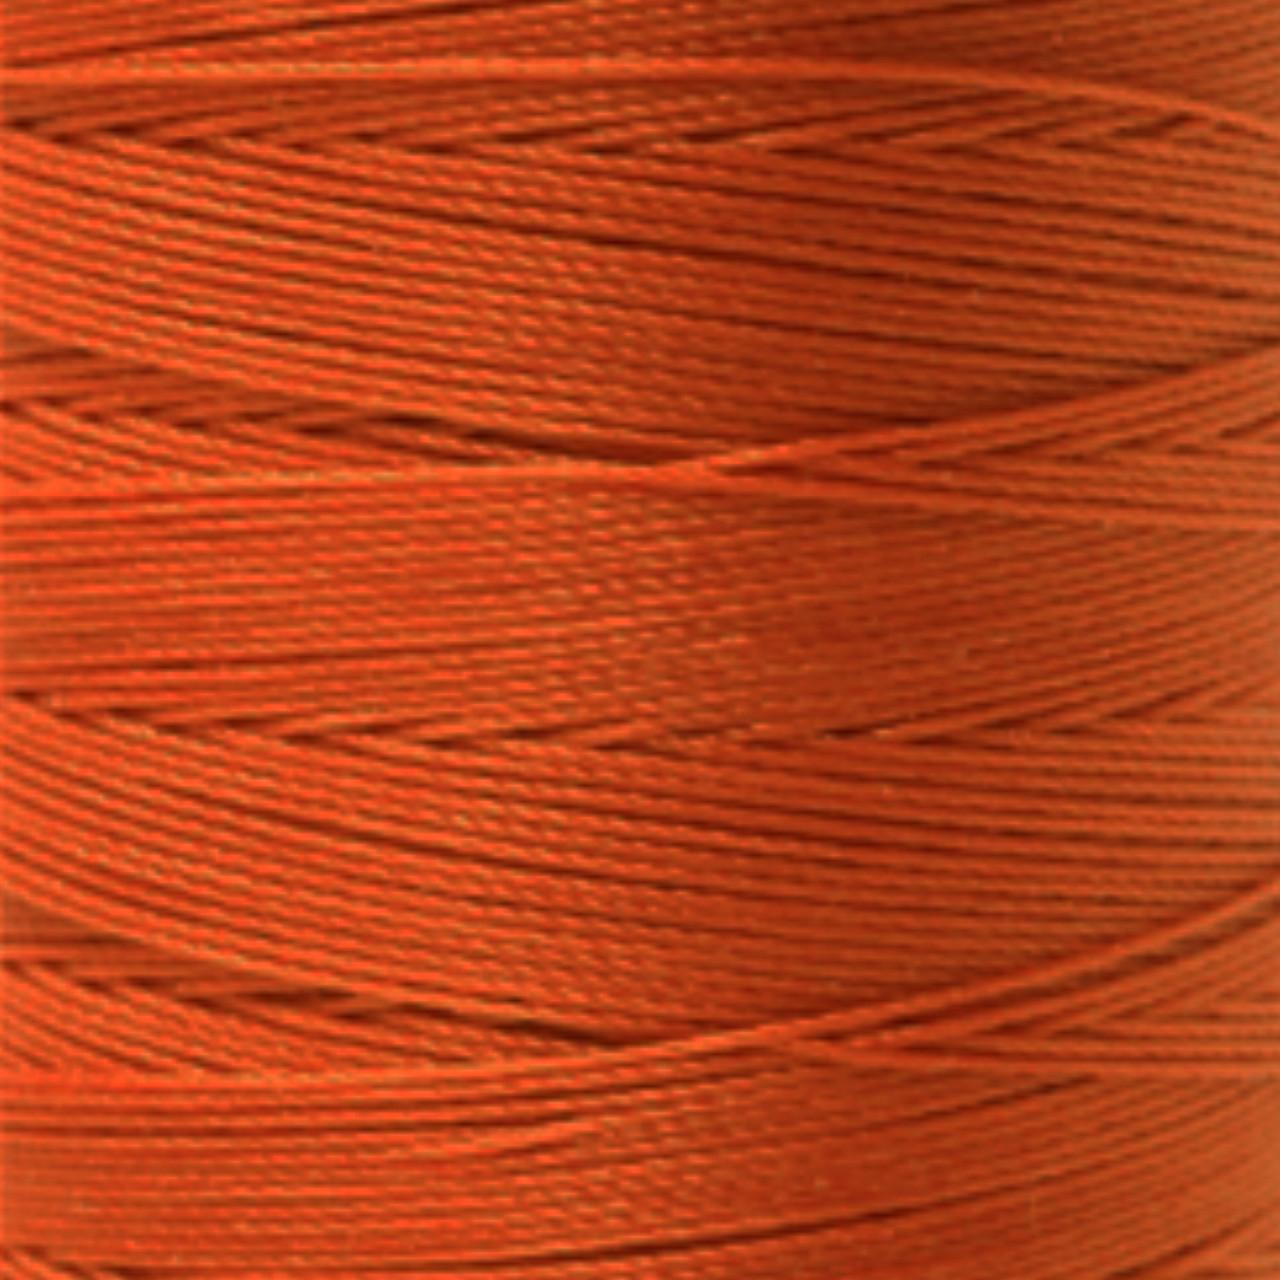 Nylon Contrast Thread - Toboggan - 8 oz Spool